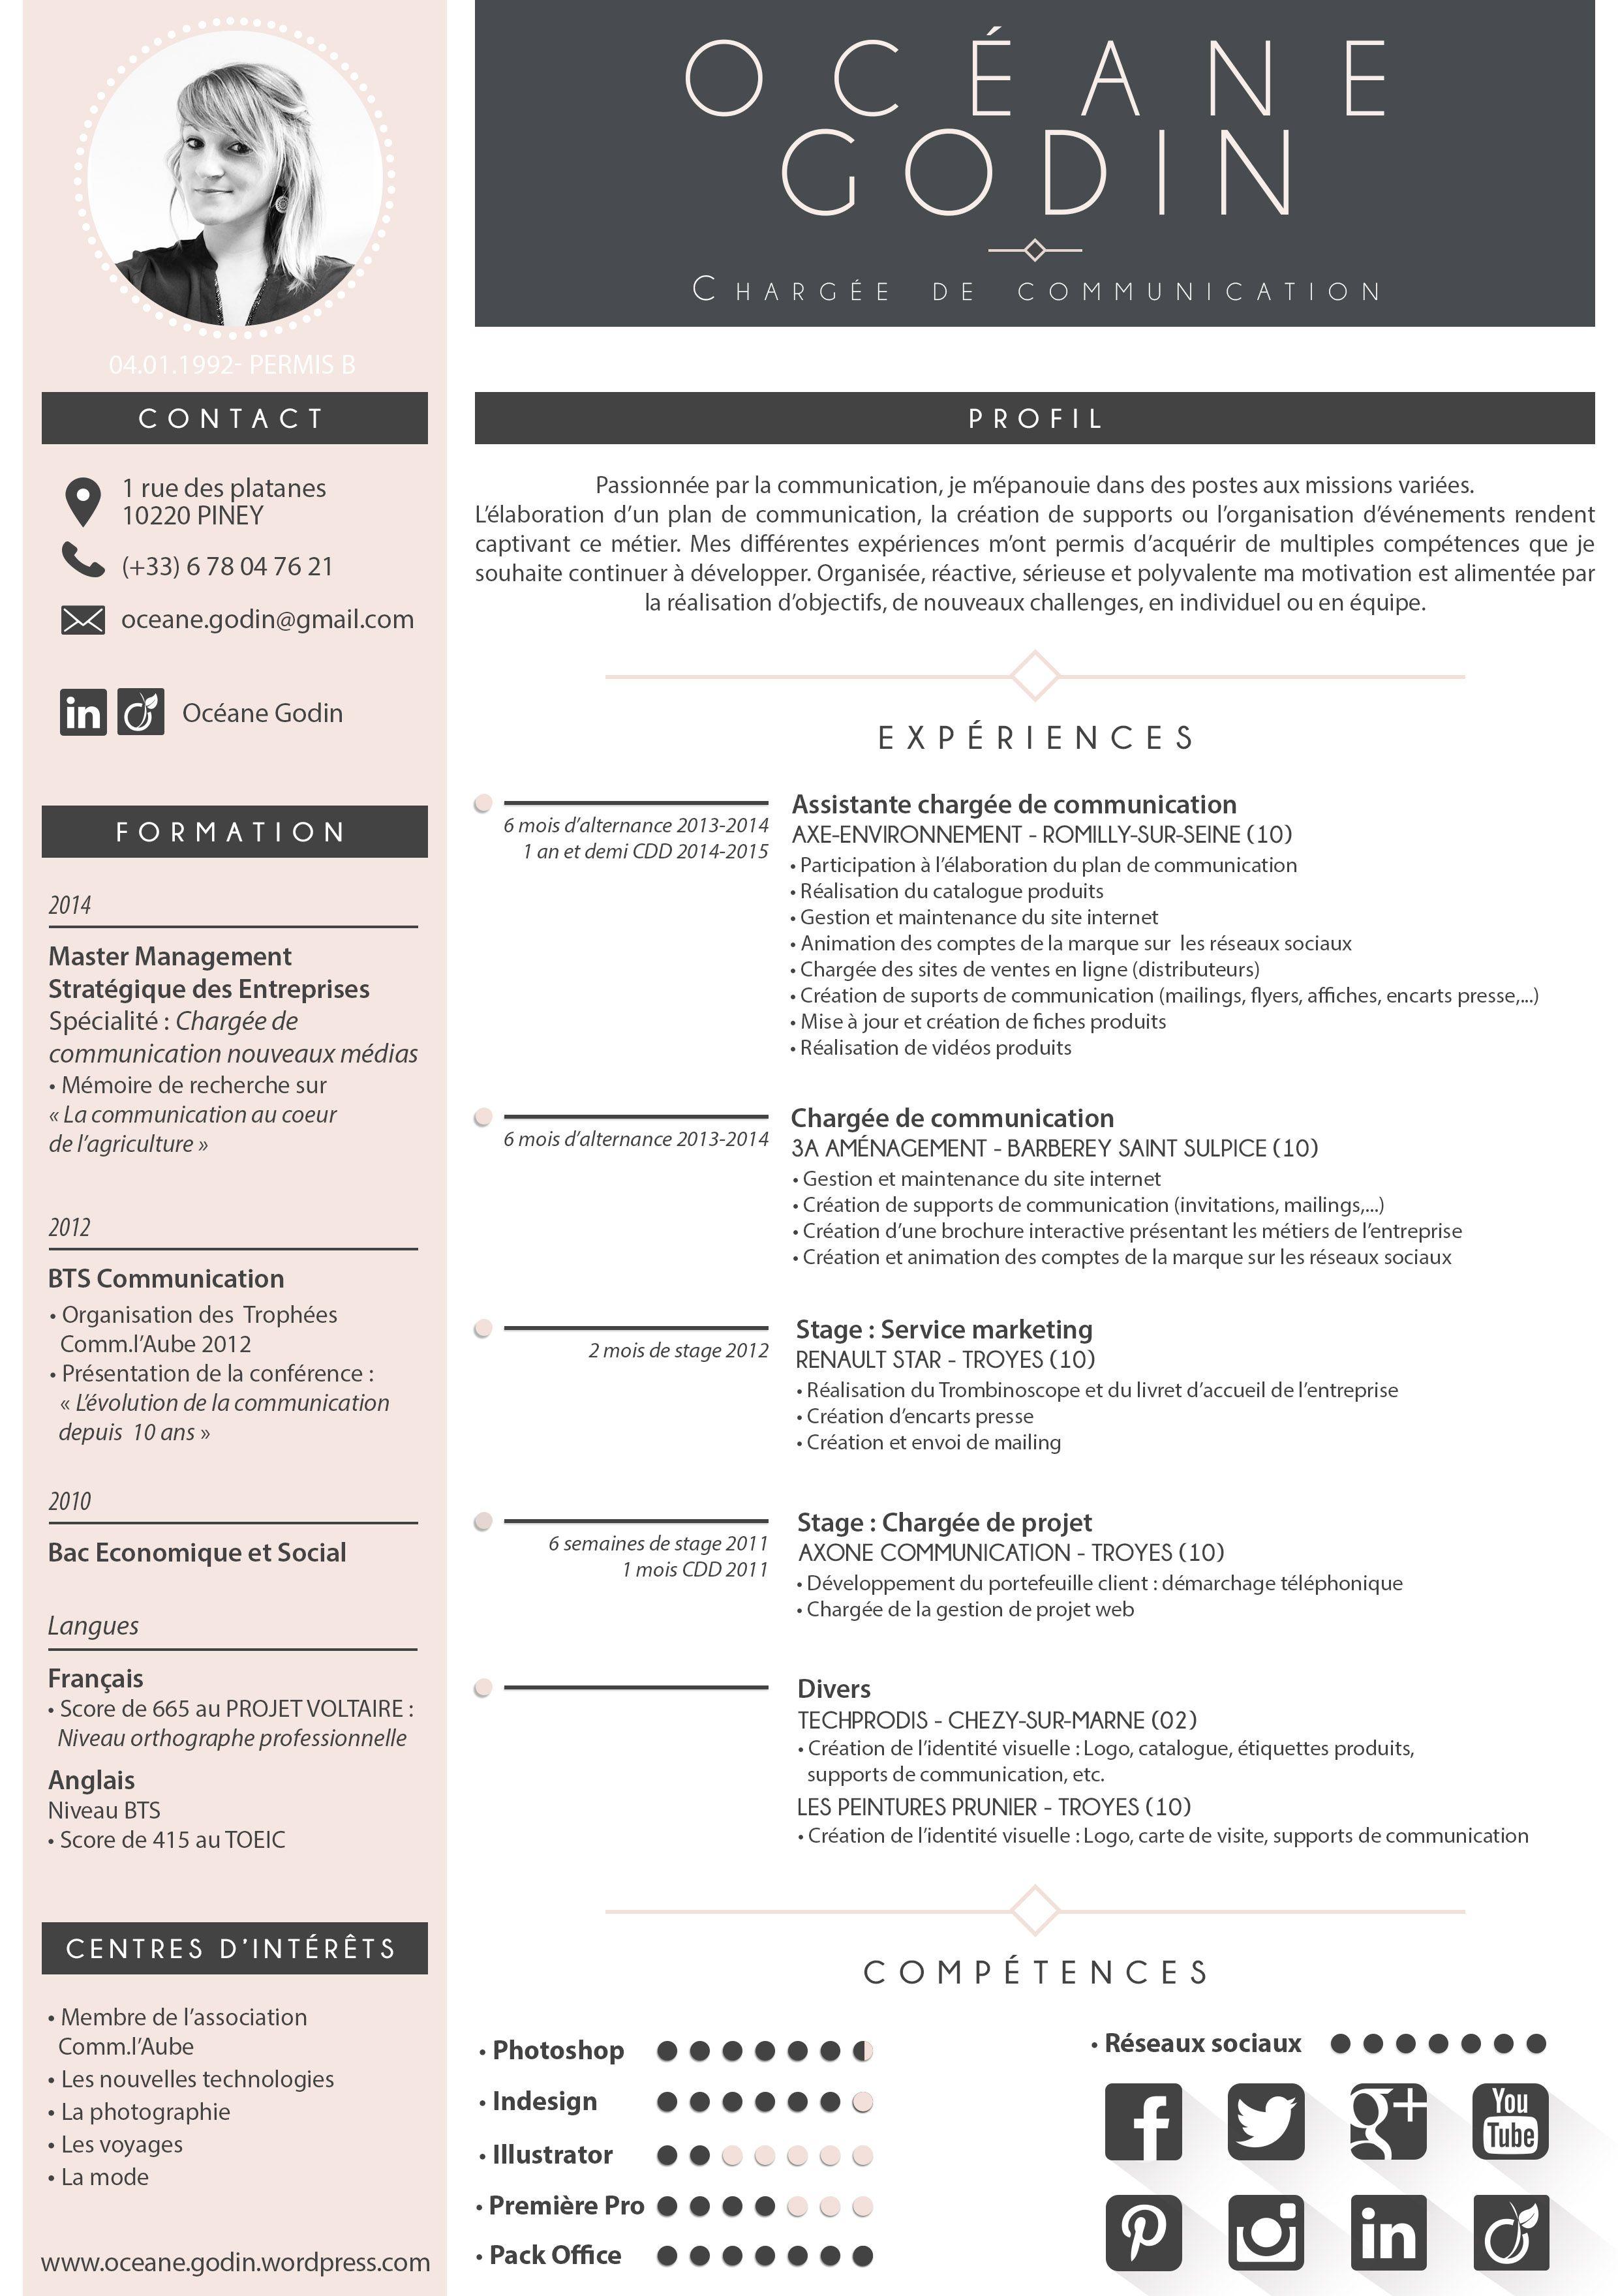 Cv Oceane Godin Juillet 2015 Curriculum Vitae Resume Examples Business Infographic